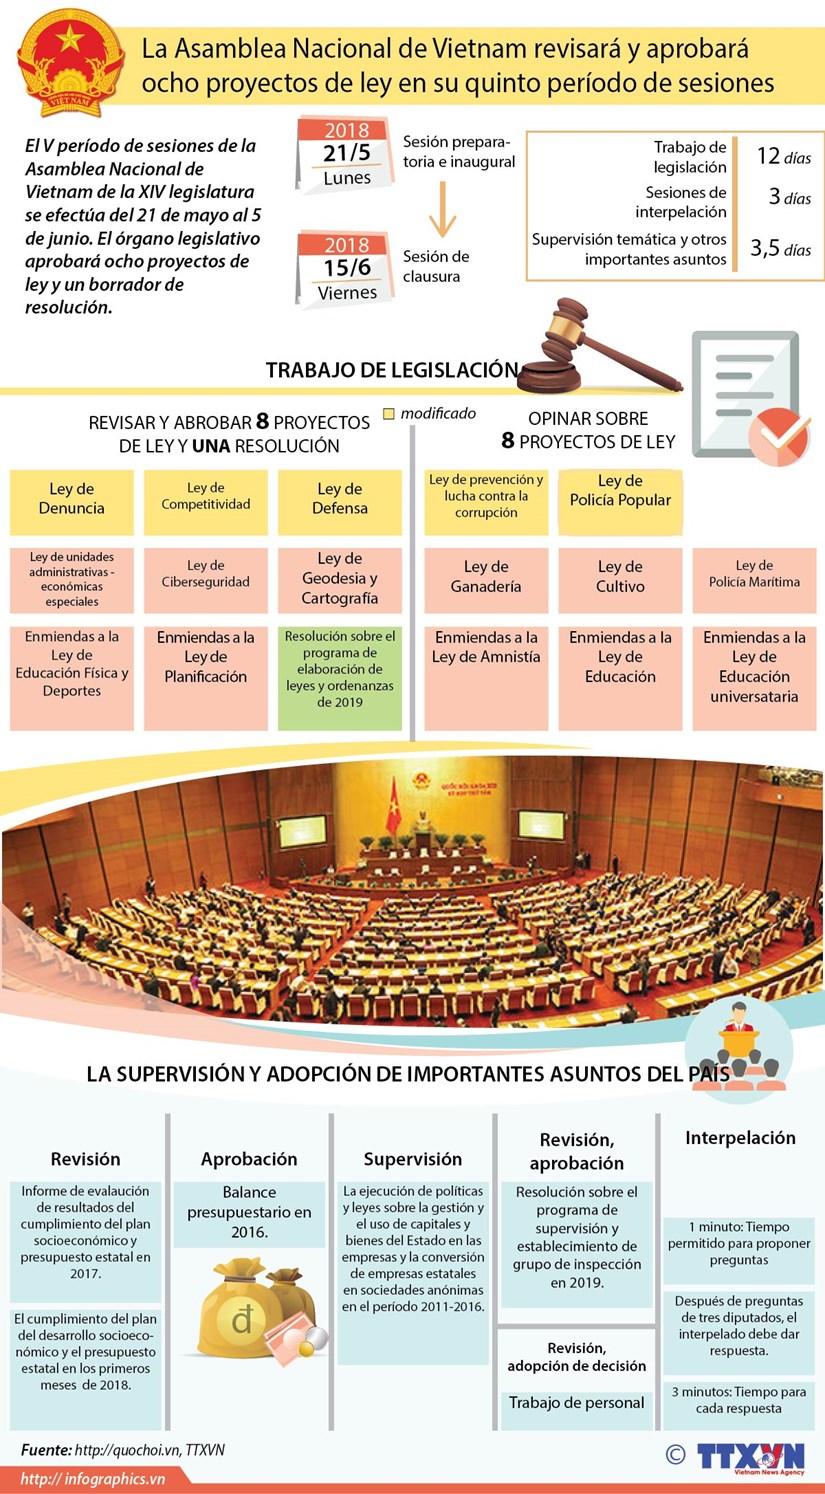 [Infografia] Inauguran quinto periodo de sesiones de la Asamblea Nacional hinh anh 1